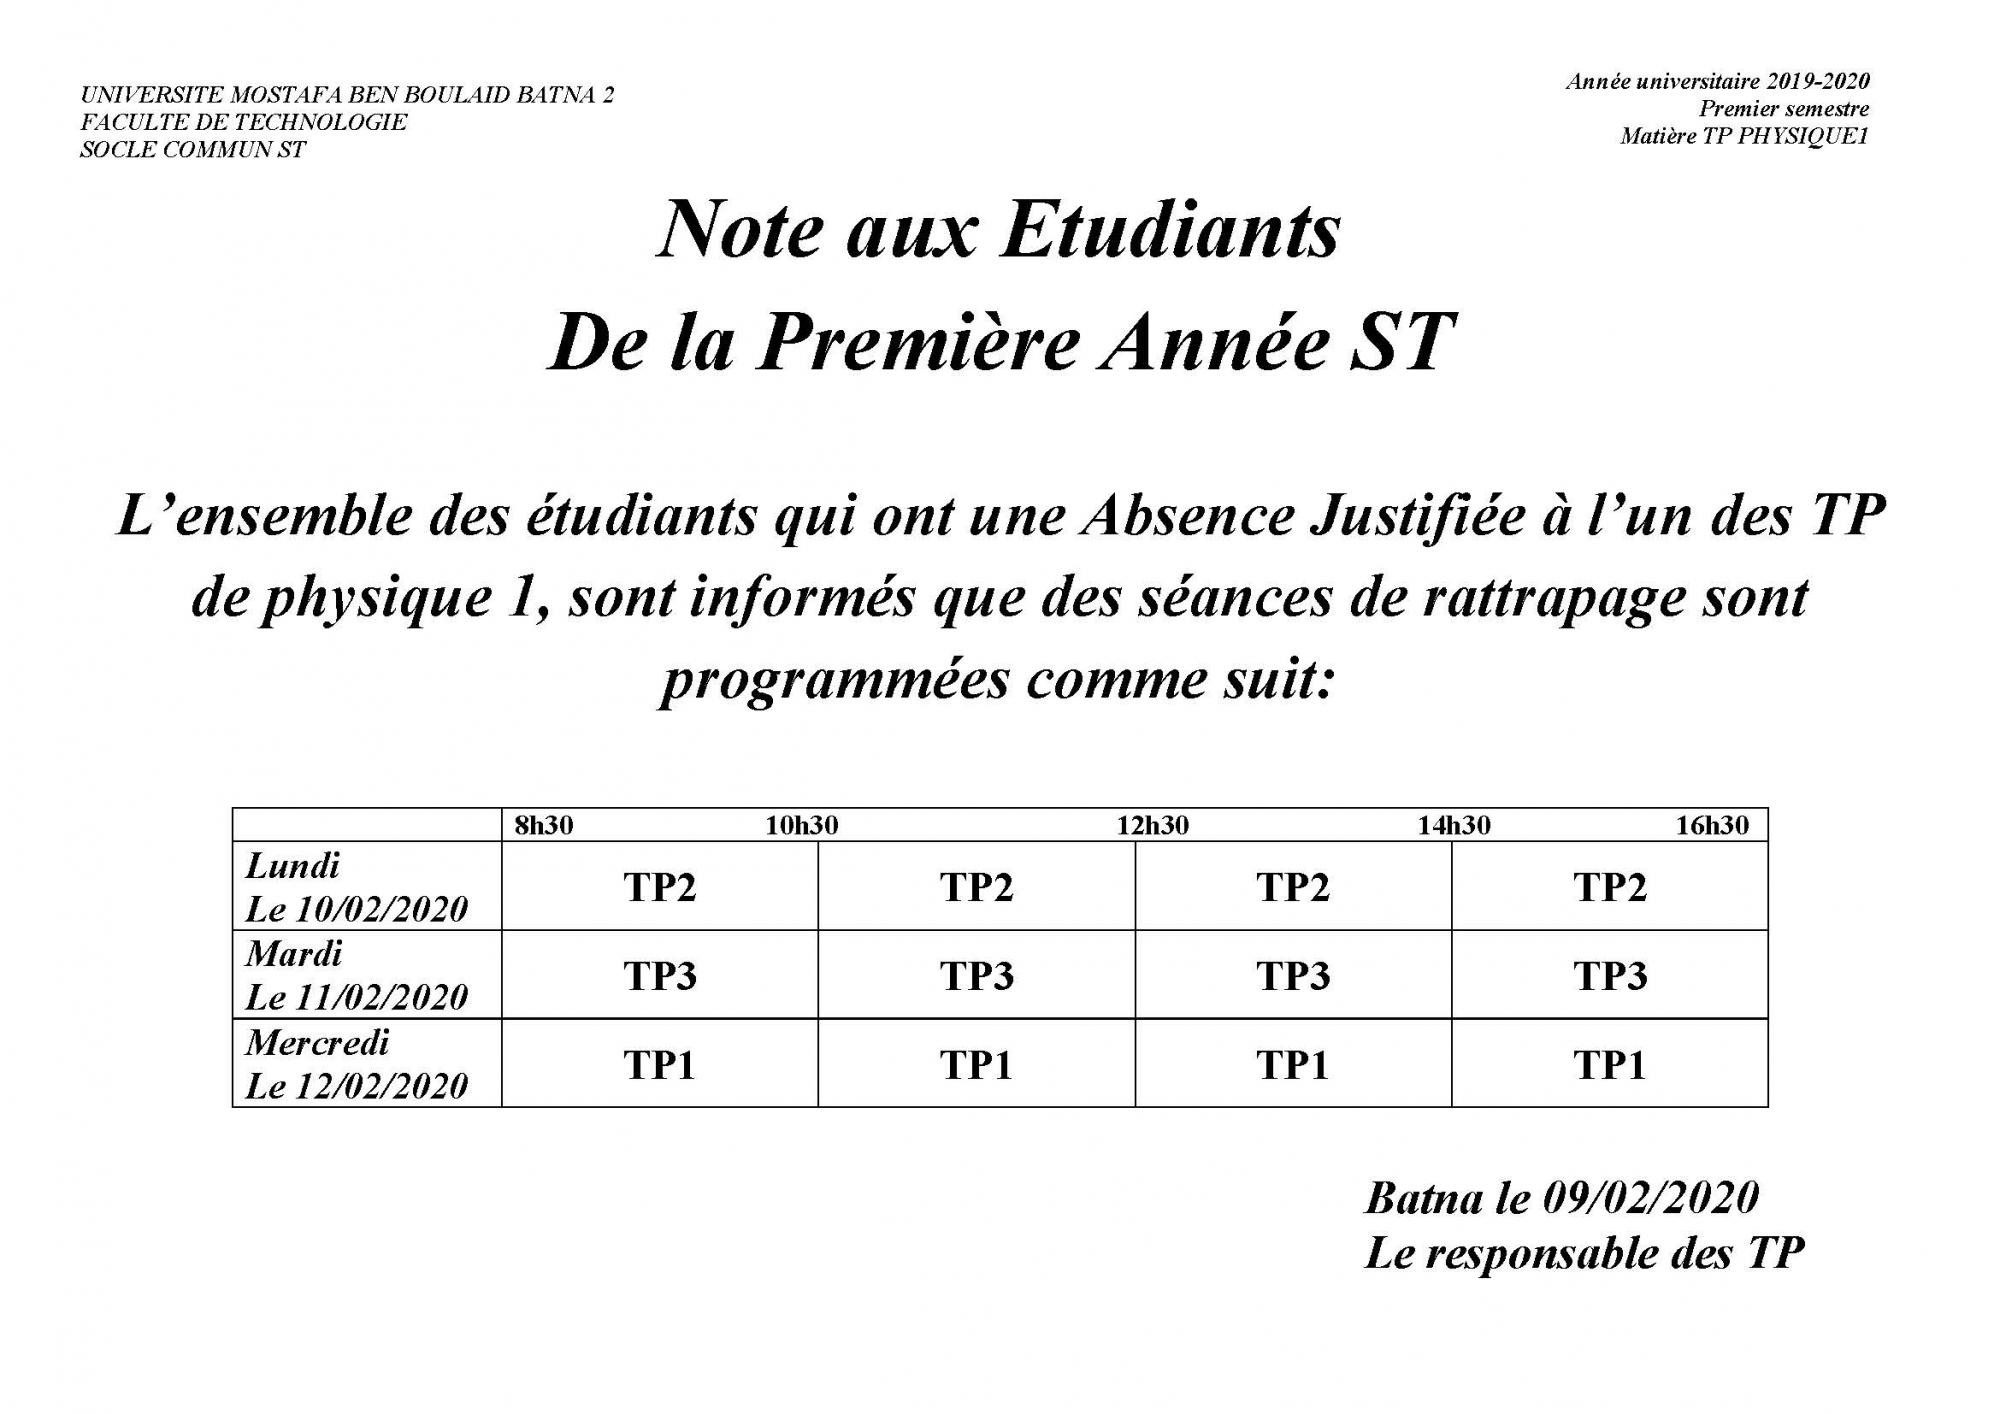 planning_de_ratt_tp_p1